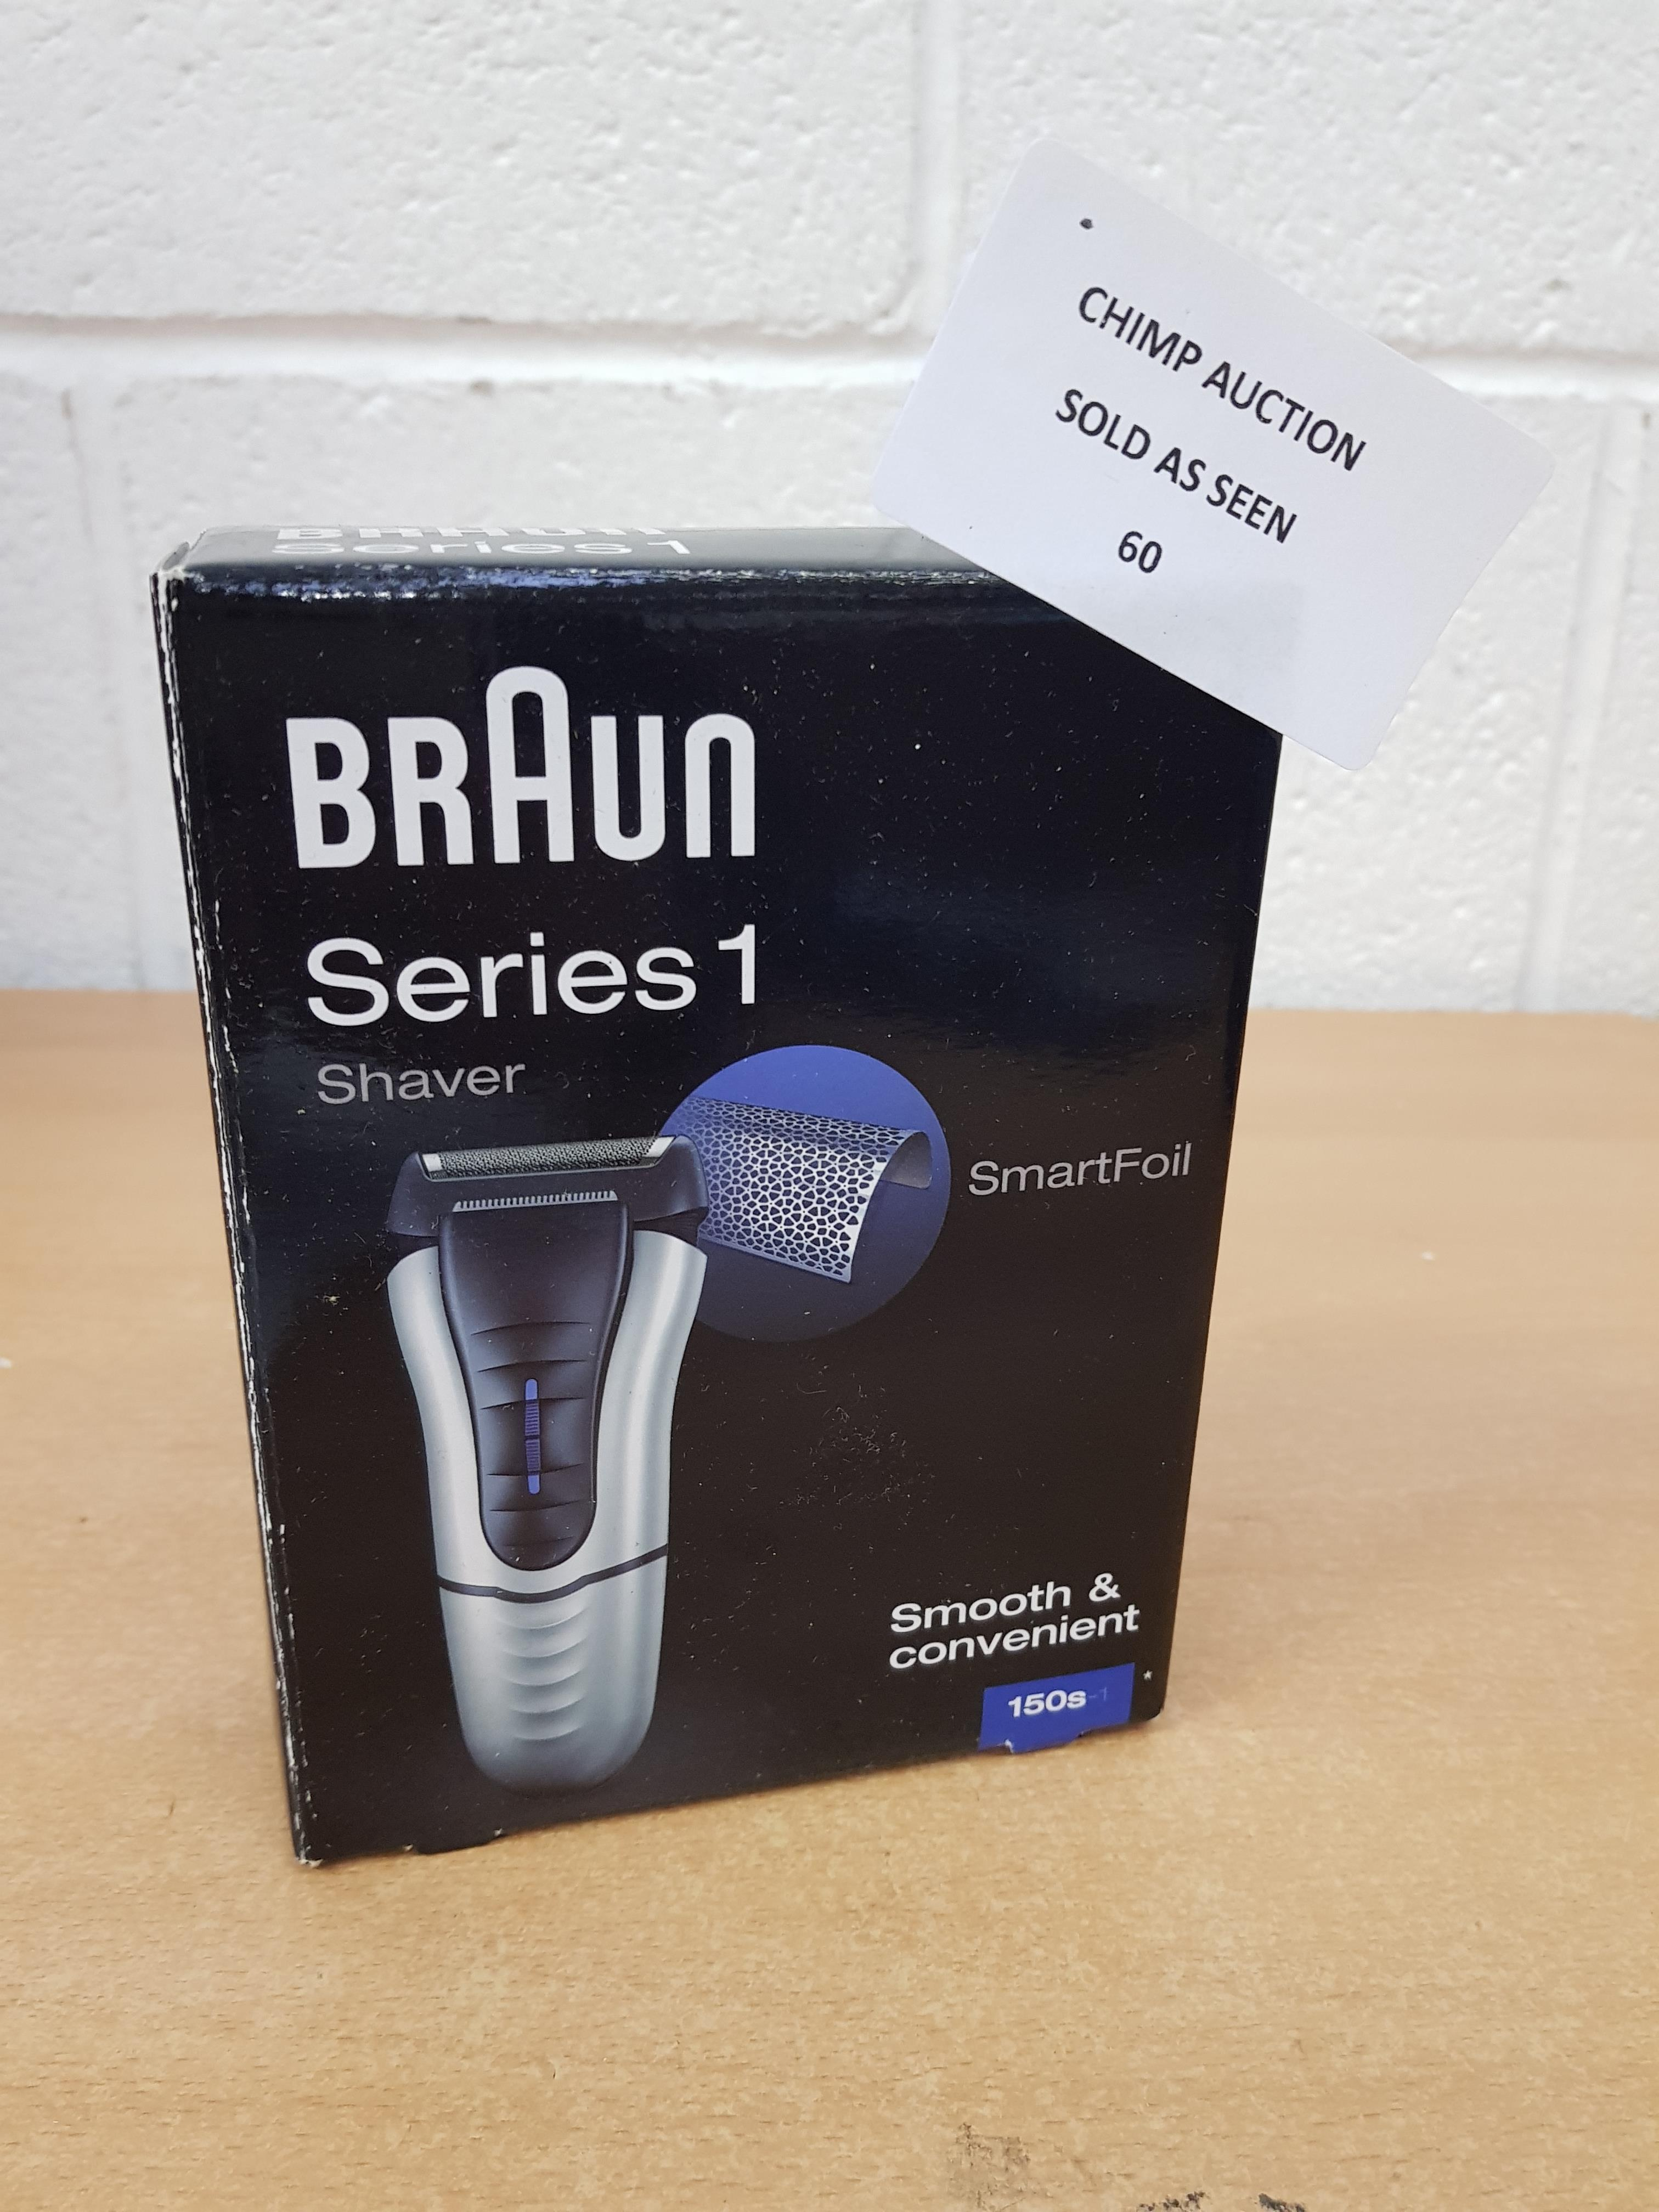 Lot 60 - Braun Series 1 150S SmartFoil Shaver